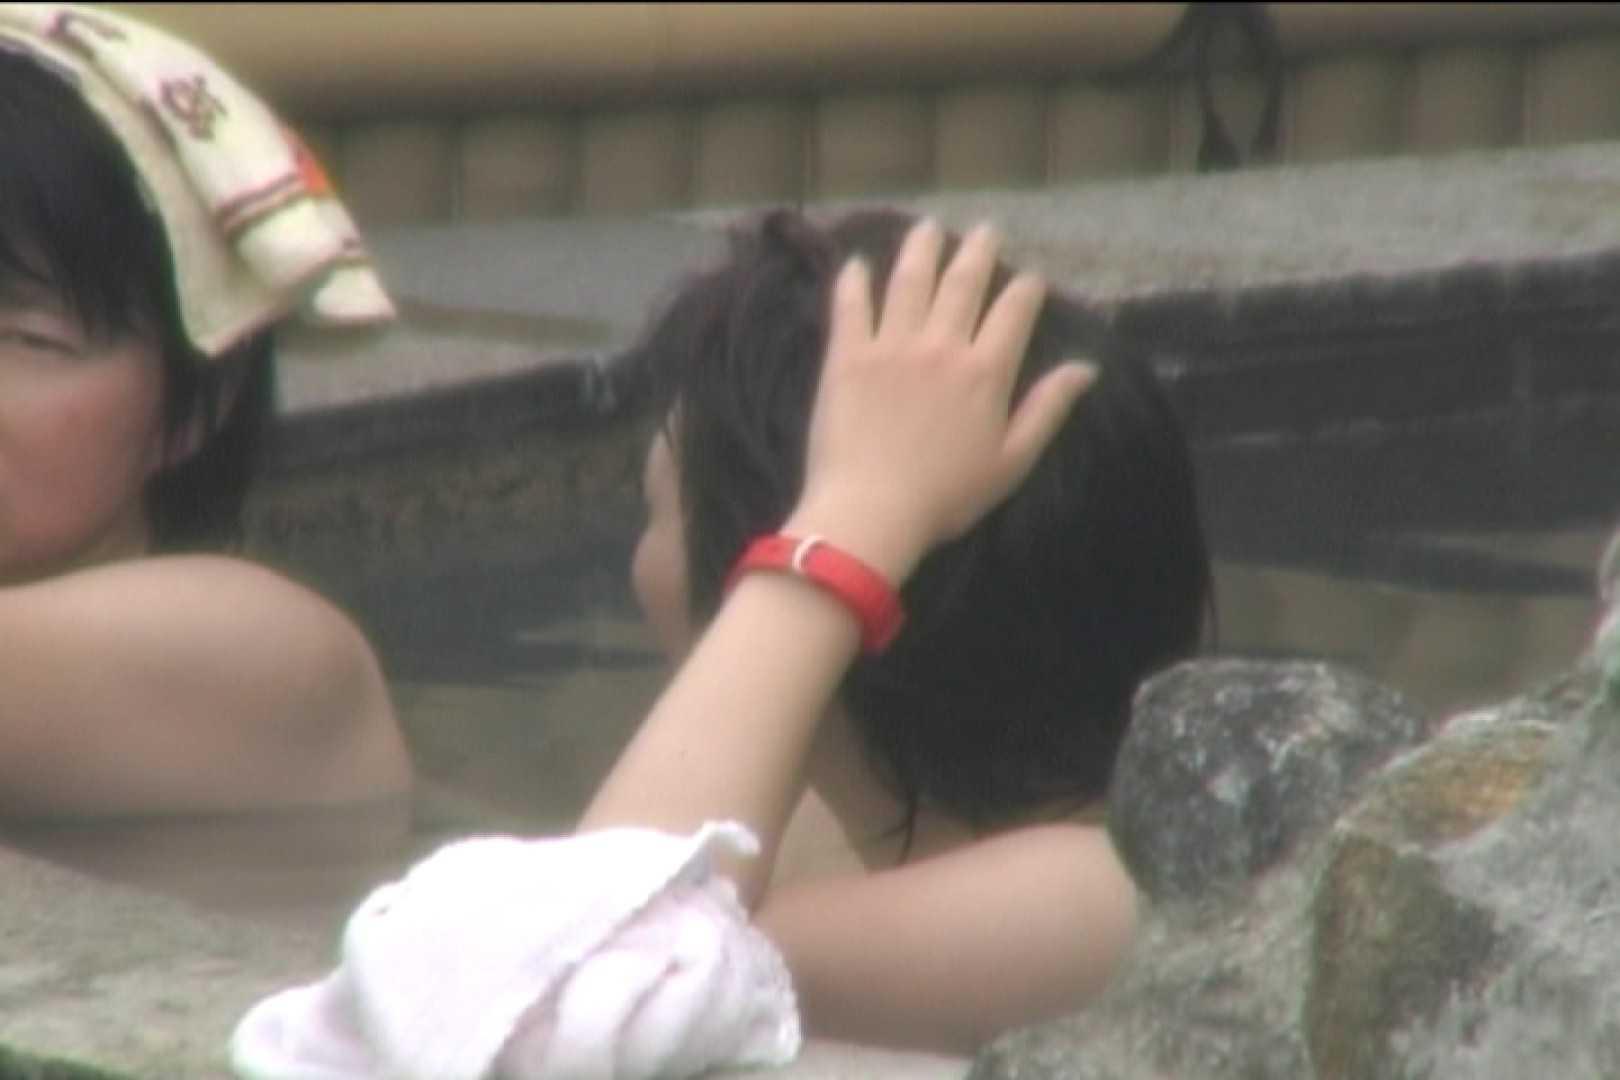 Aquaな露天風呂Vol.122 露天 おめこ無修正動画無料 107pic 91